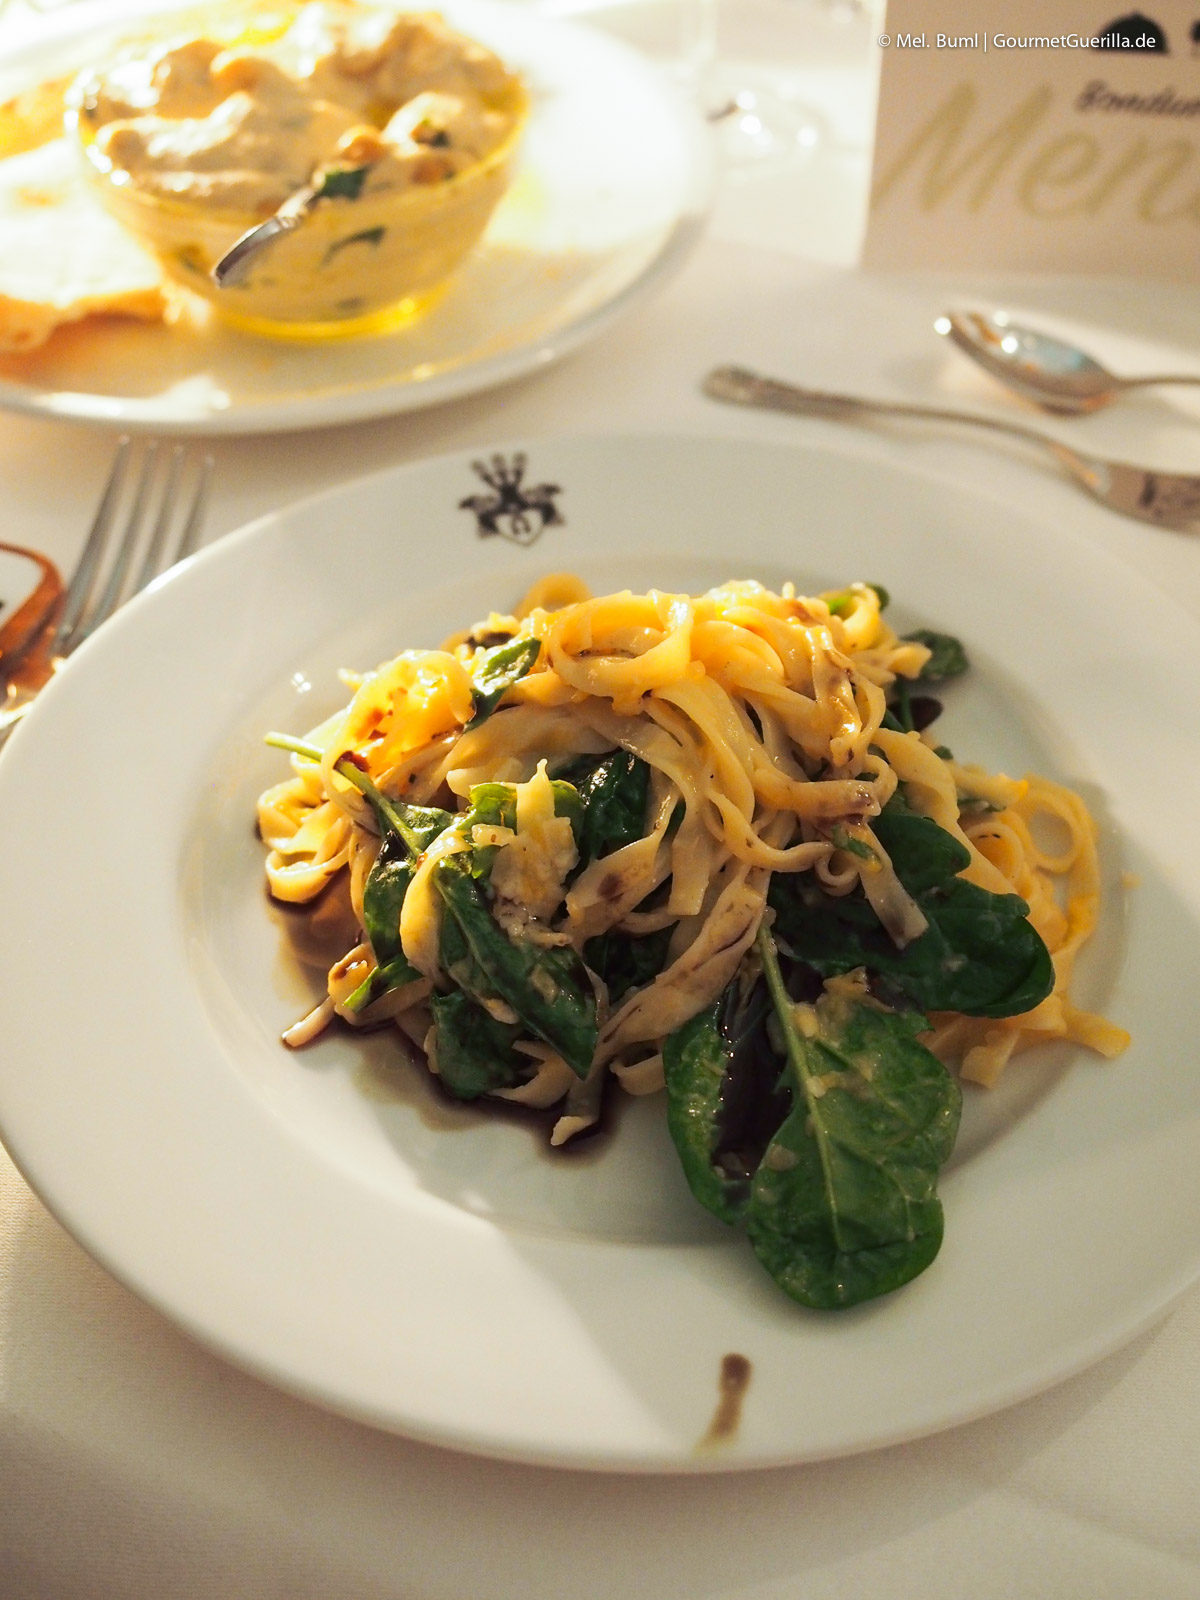 Hauptgang Dinner Bonduelle Academy |GourmetGuerilla.de